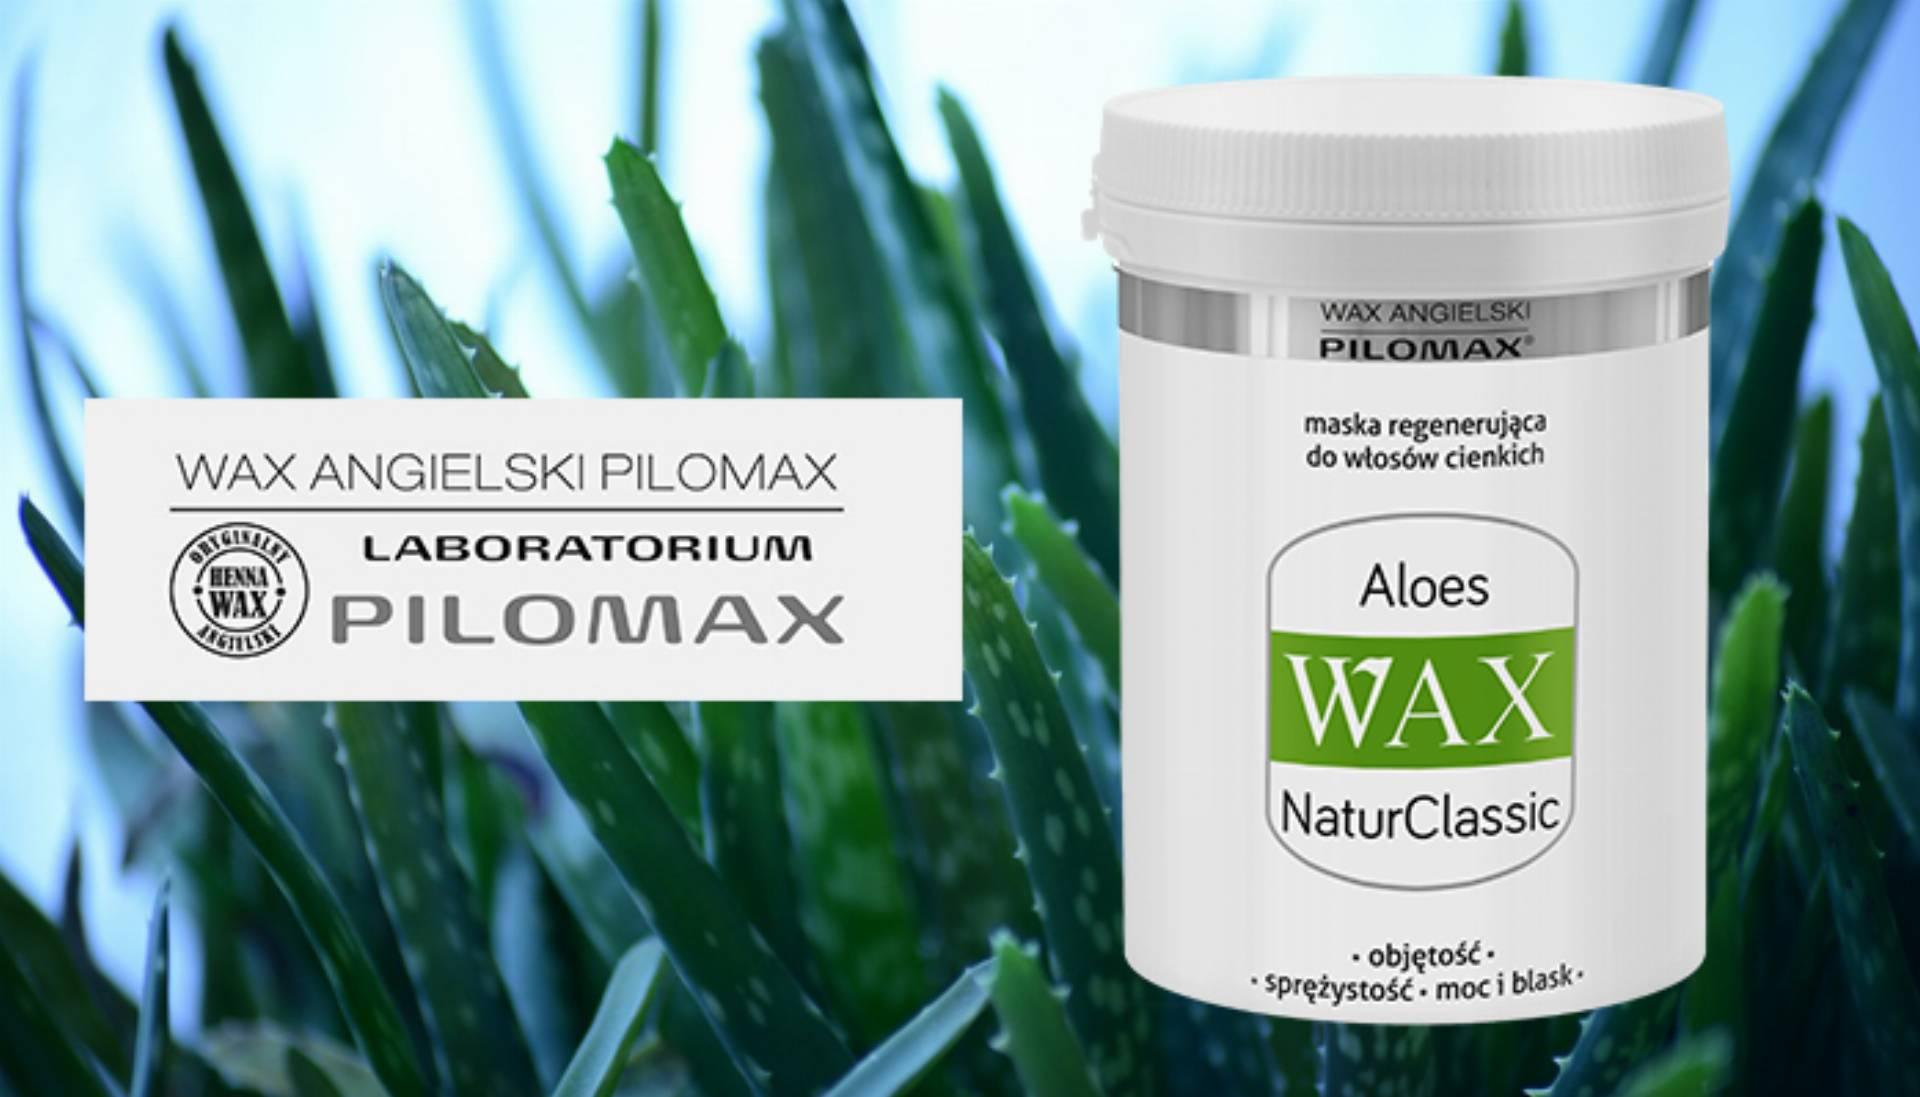 Maska Aloes WAX NaturClassic